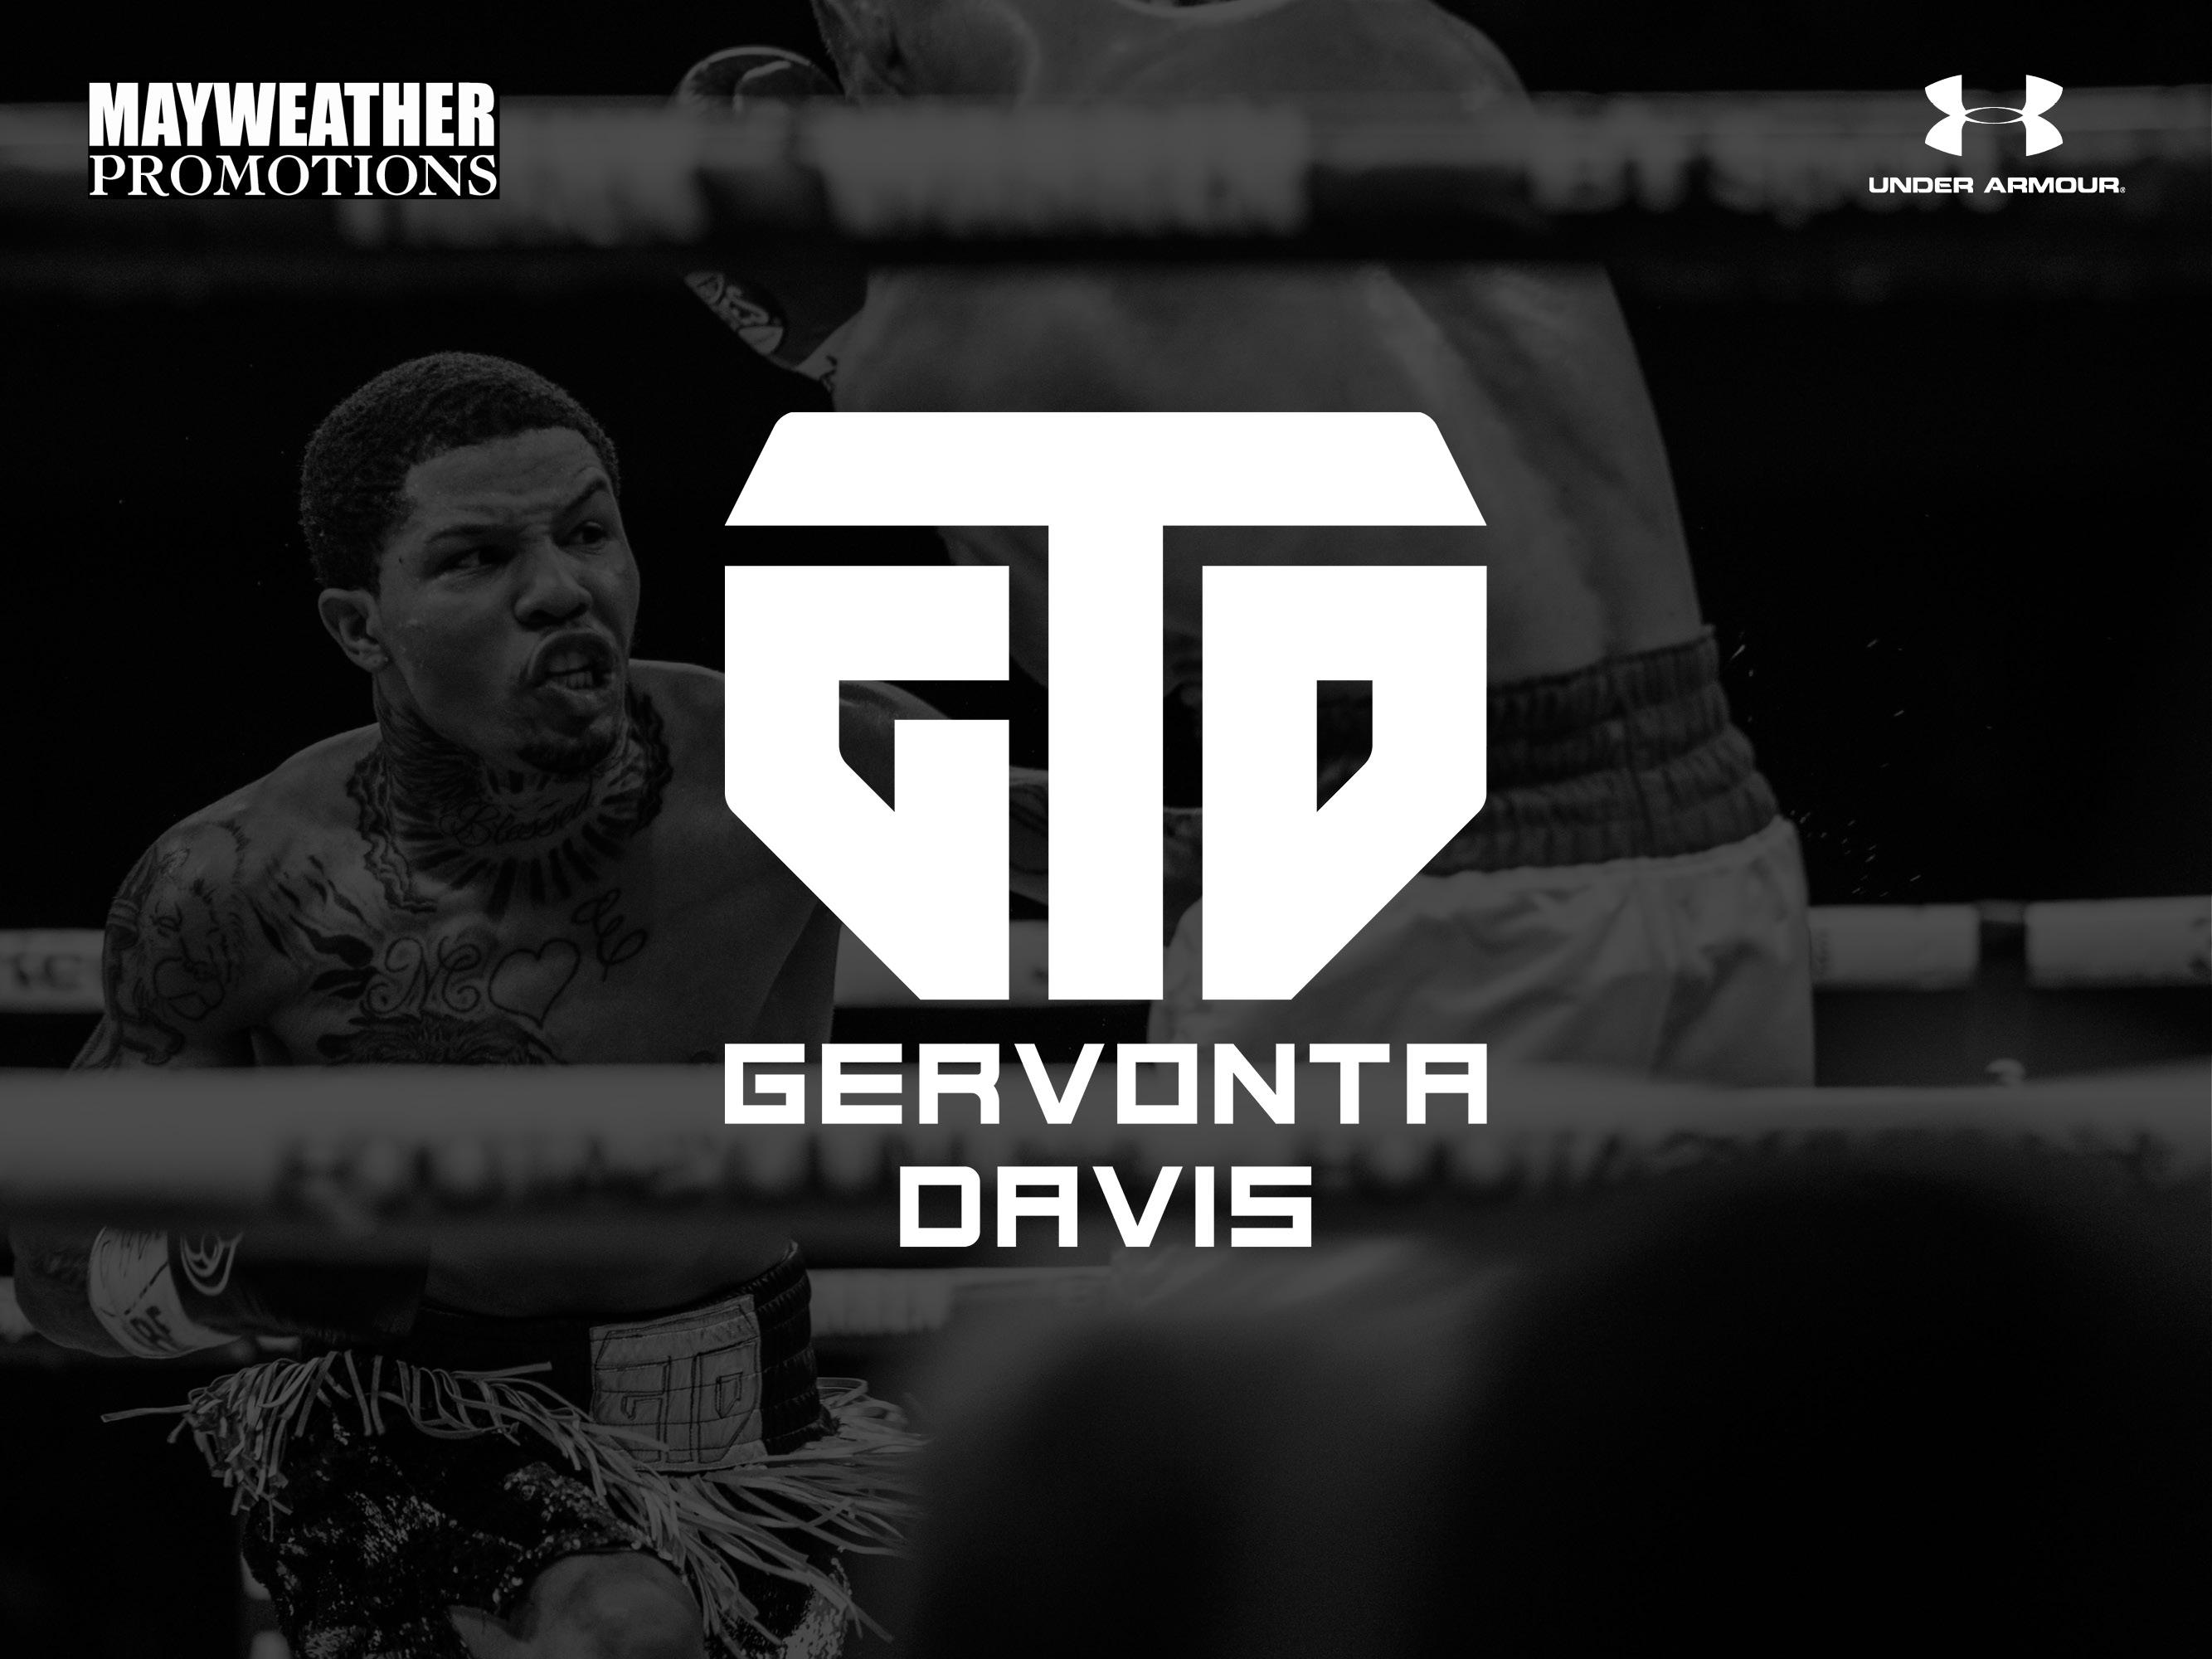 Gervonta 'Tank' Davis GTD Mayweather Promotions athlete logo design